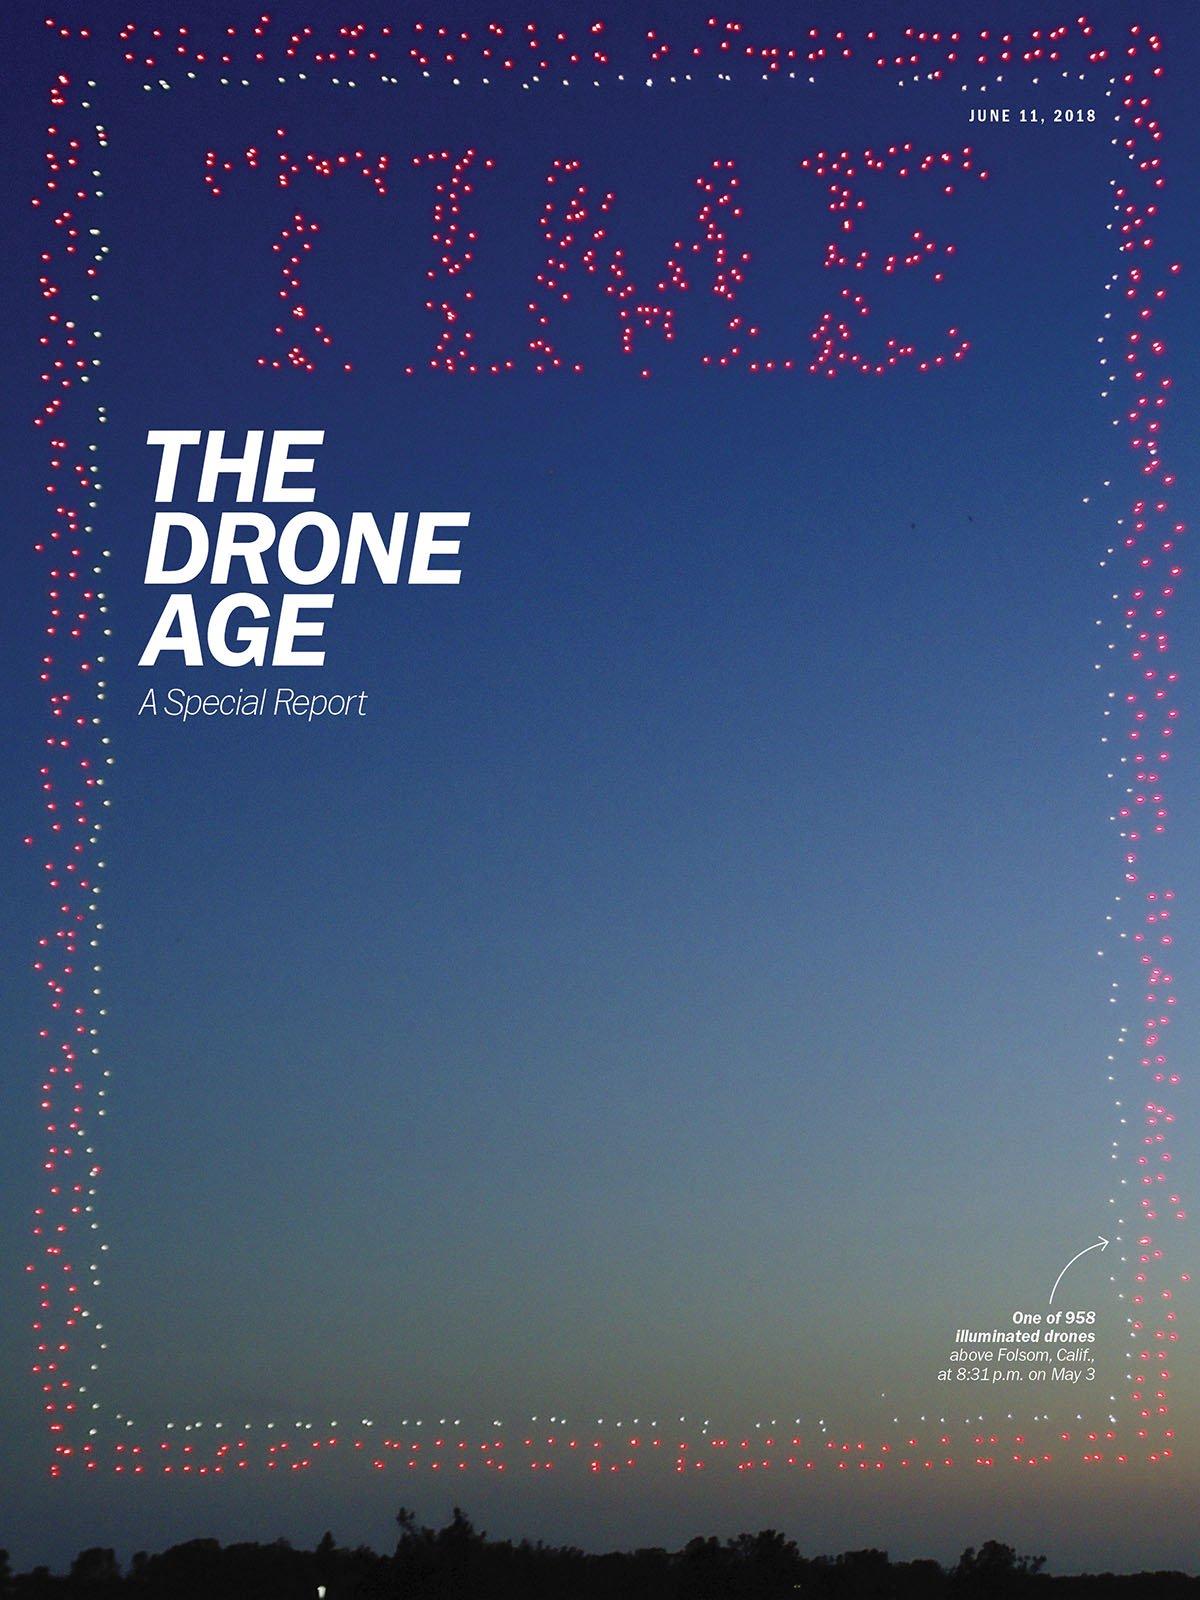 timemagazine-drone-cover.jpg